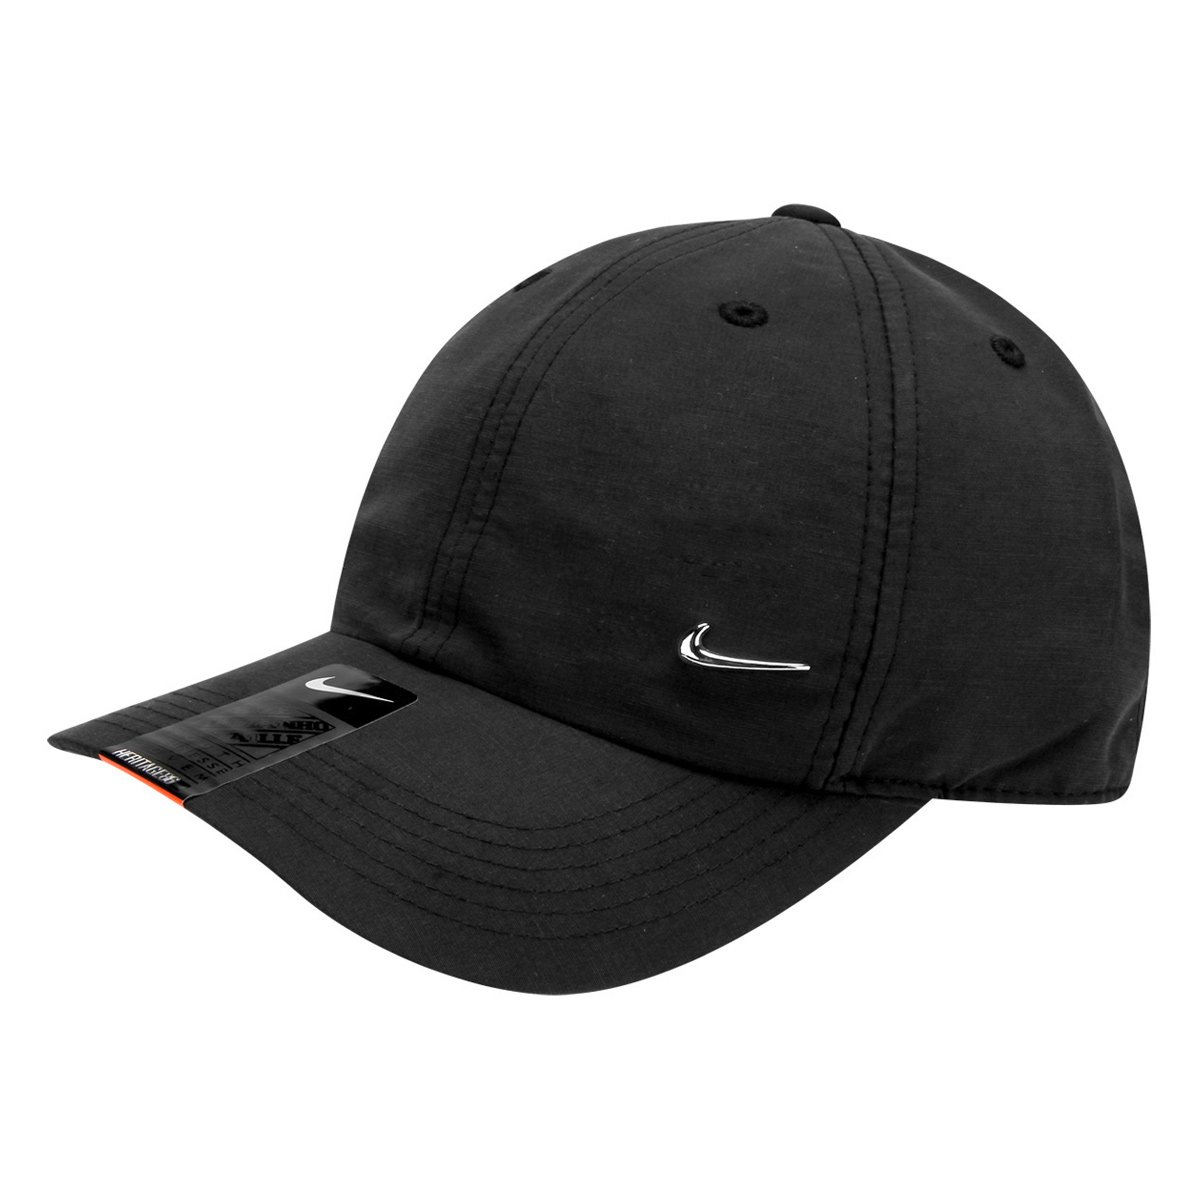 a371cf8bef3a6 Boné Infantil Nike Aba Curva Heritage 86 Metal Swoosh - Compre Agora ...